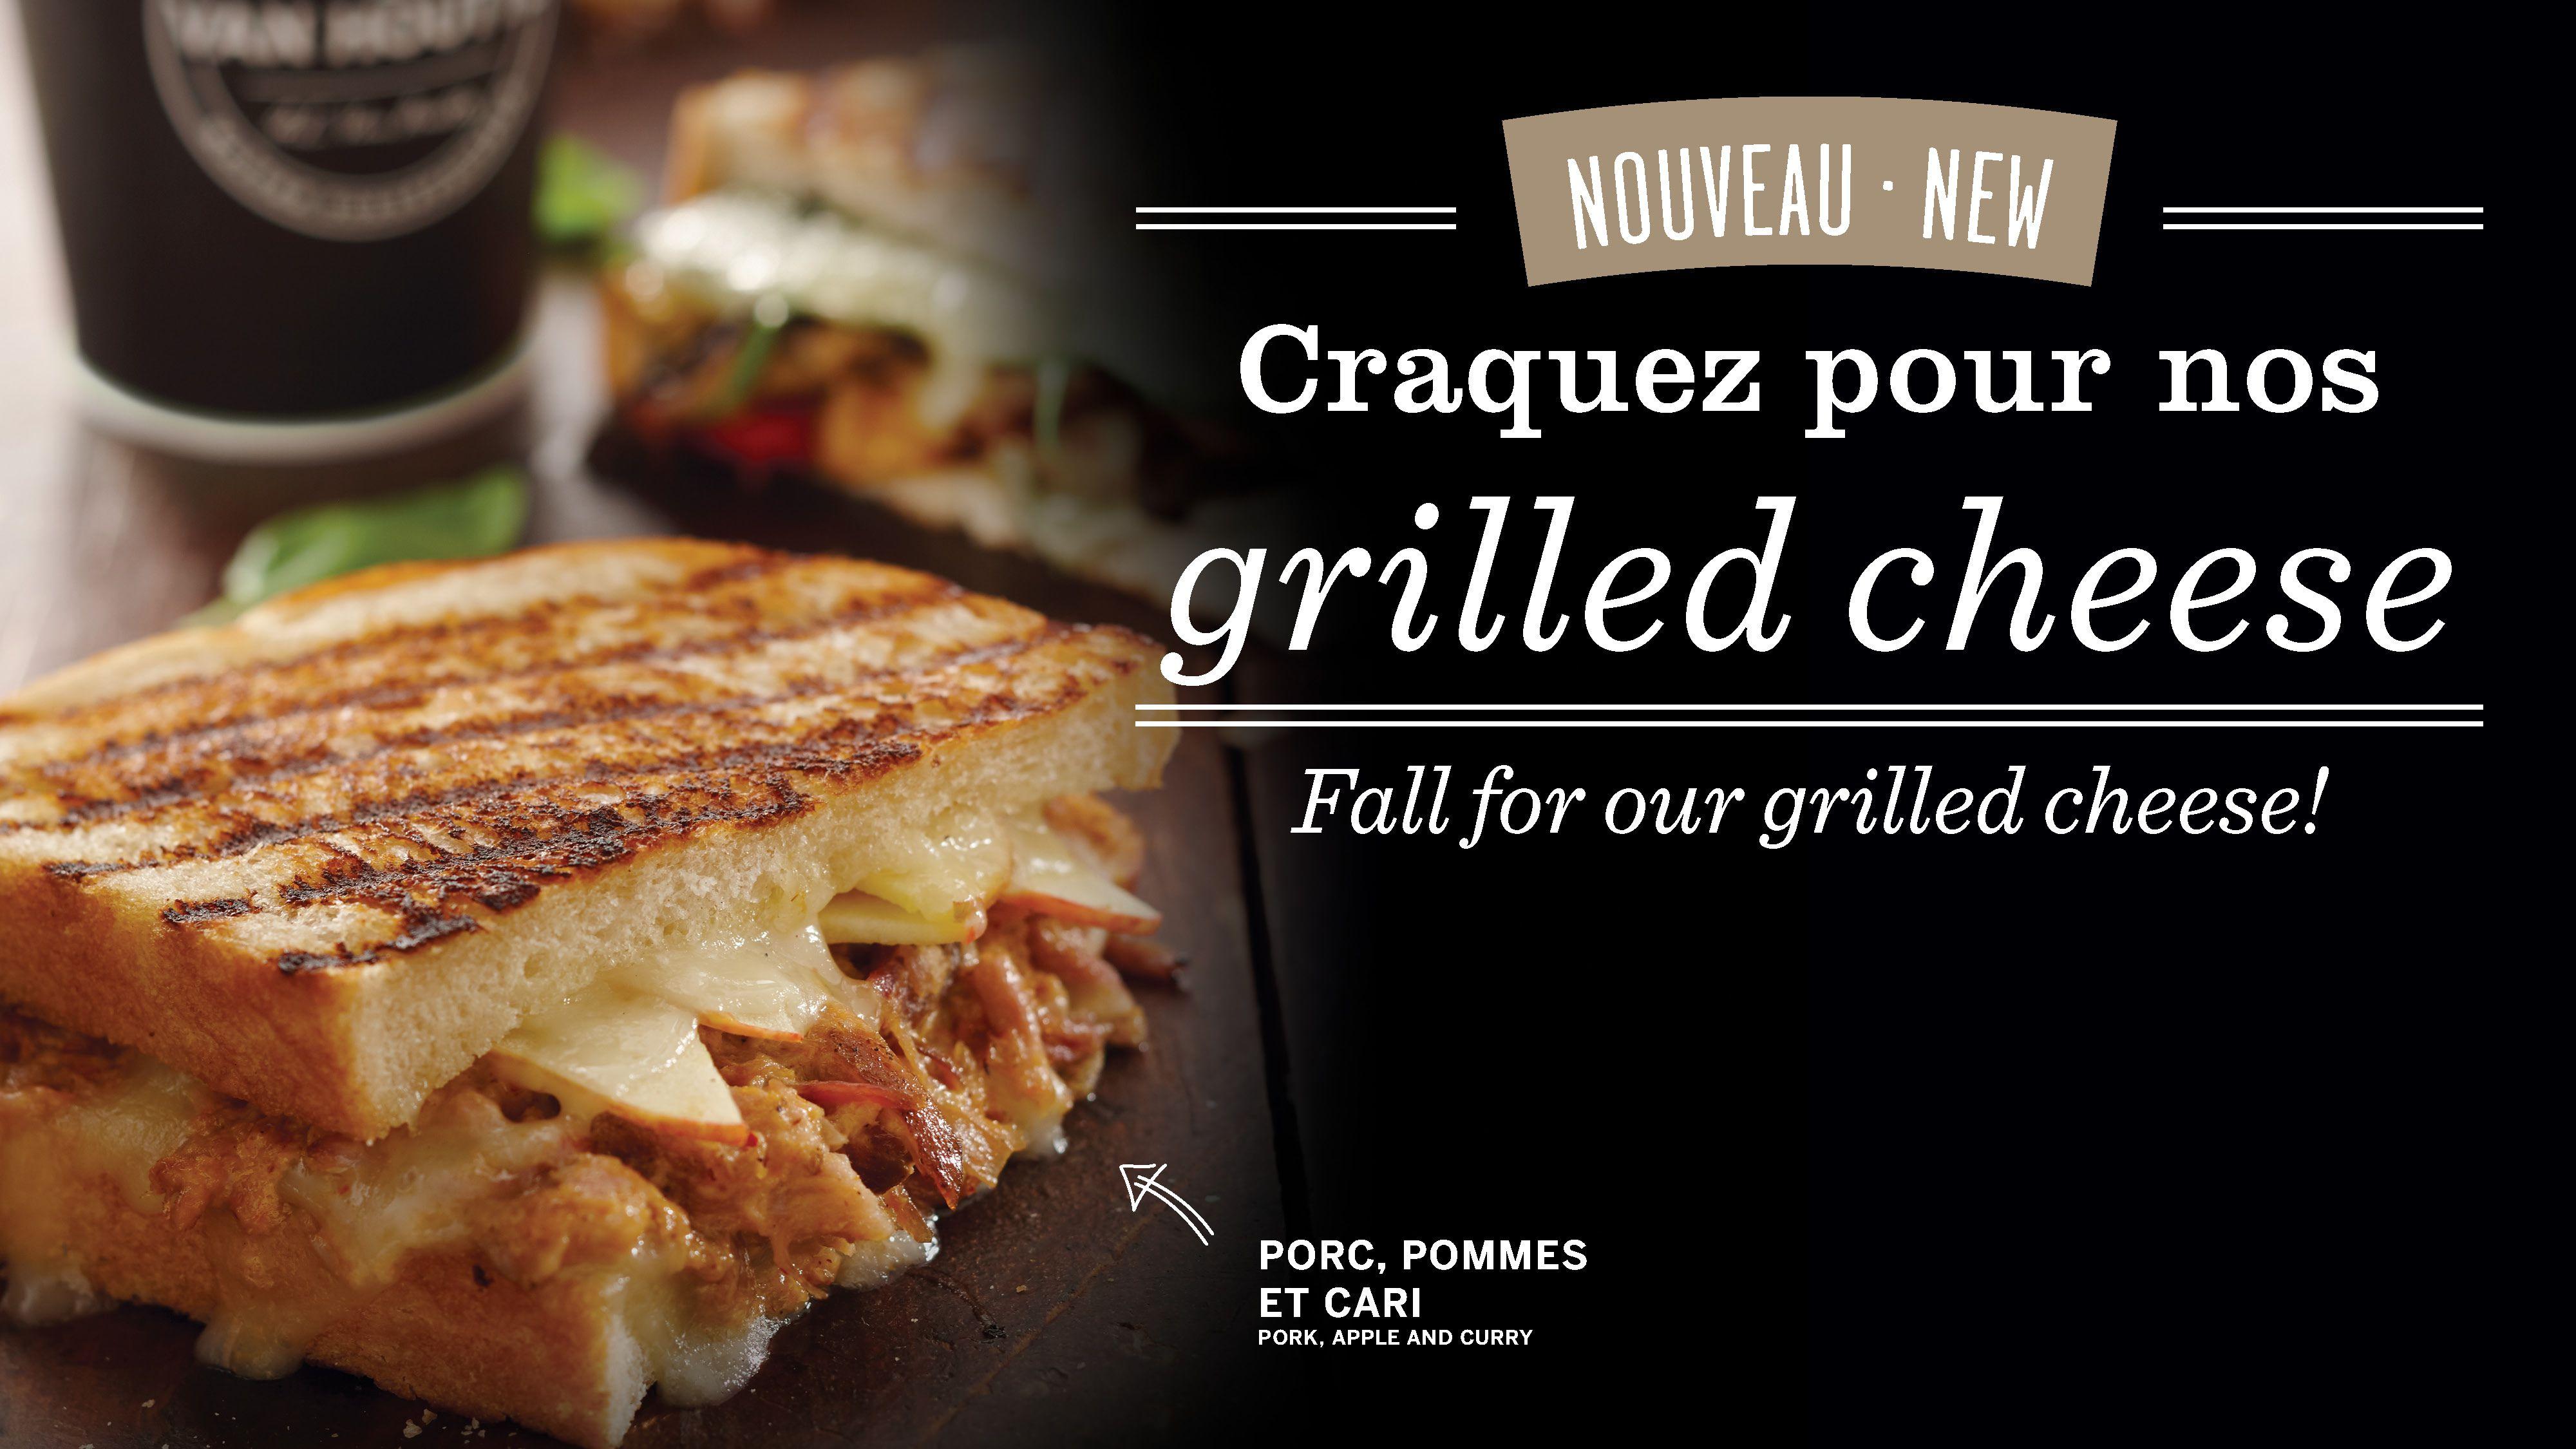 Craquez pour nos grilled cheese!